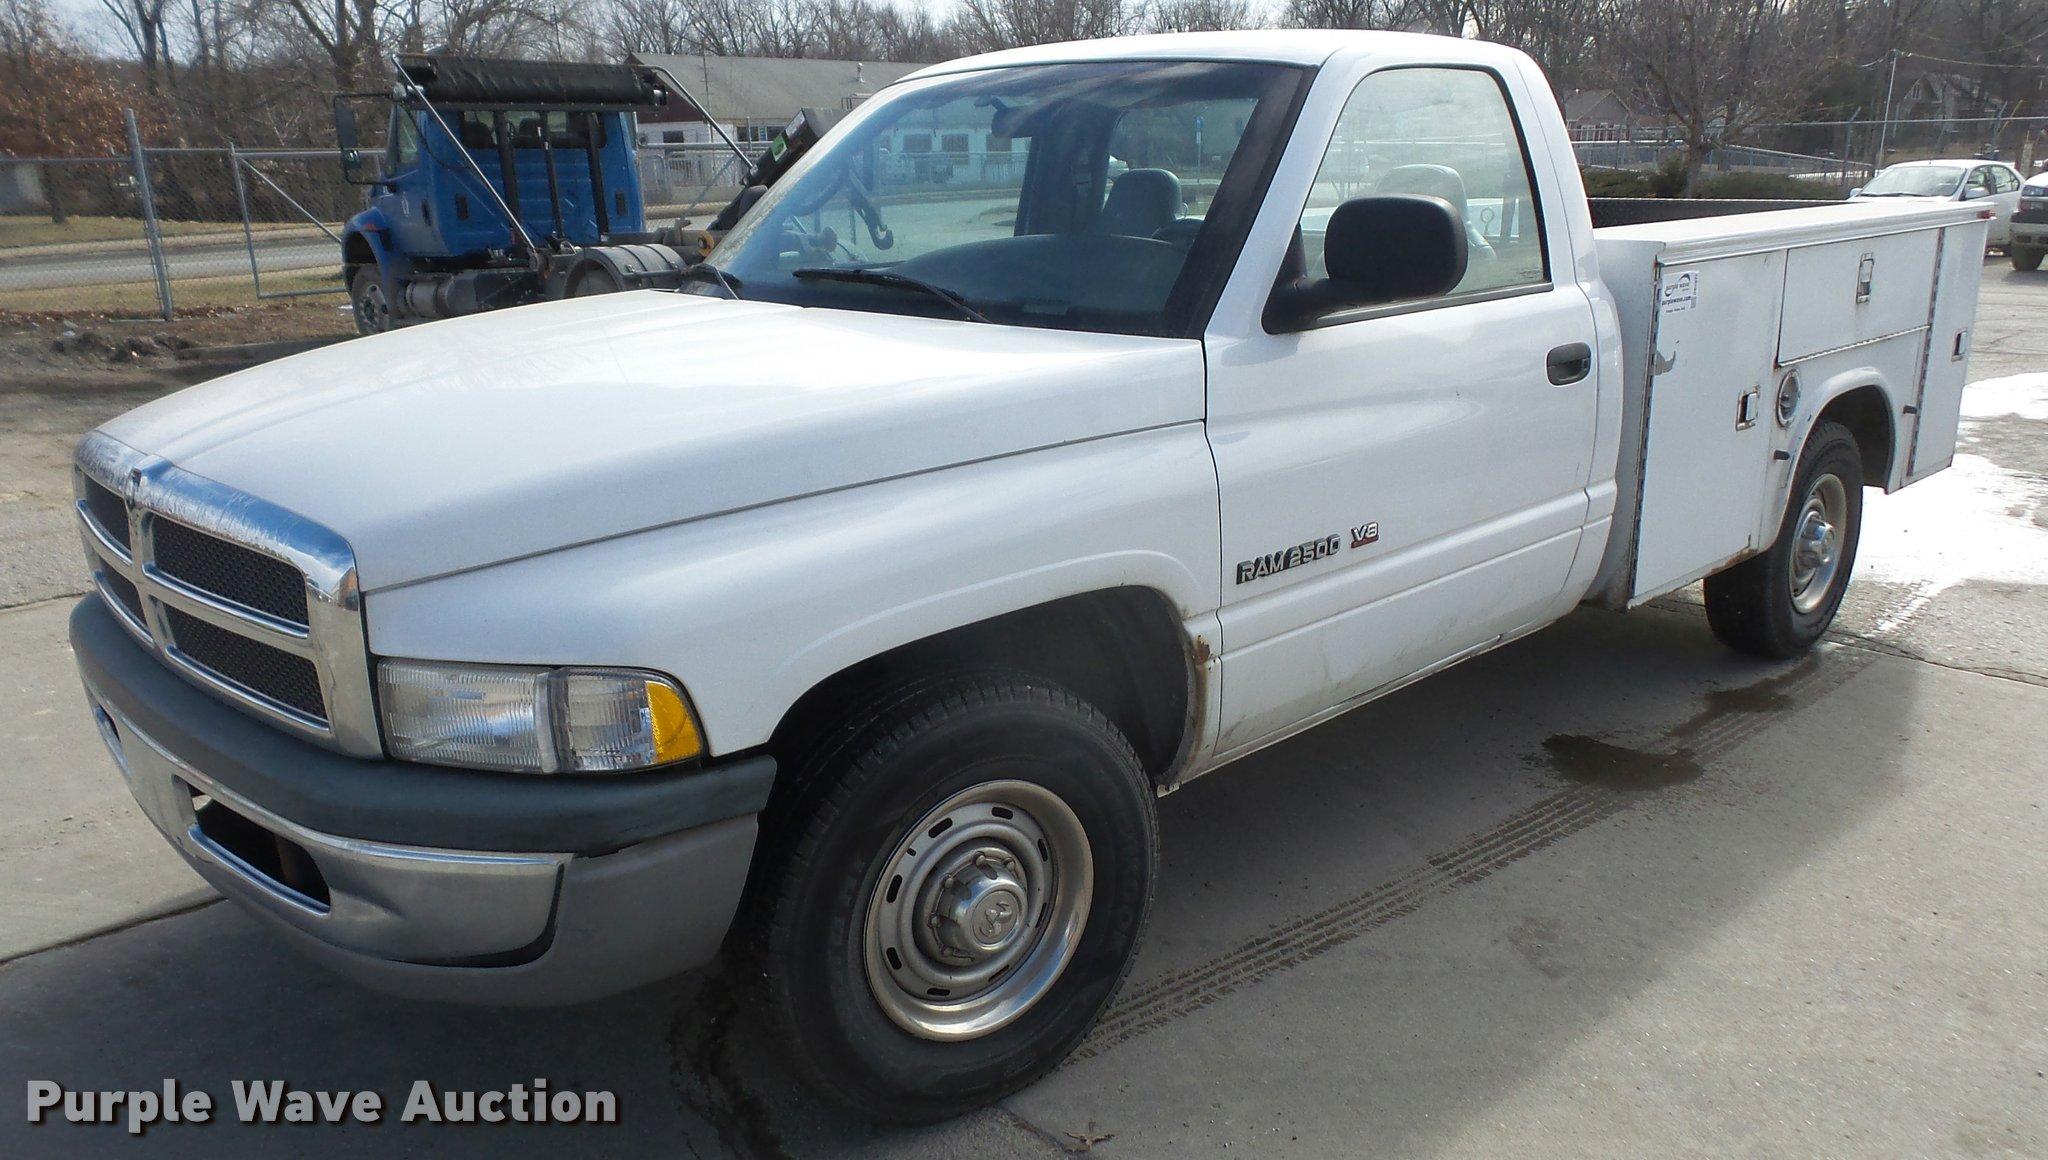 1999 Dodge Ram 2500 Utility Truck In Lawrence Ks Item Db2972 Sold Purple Wave